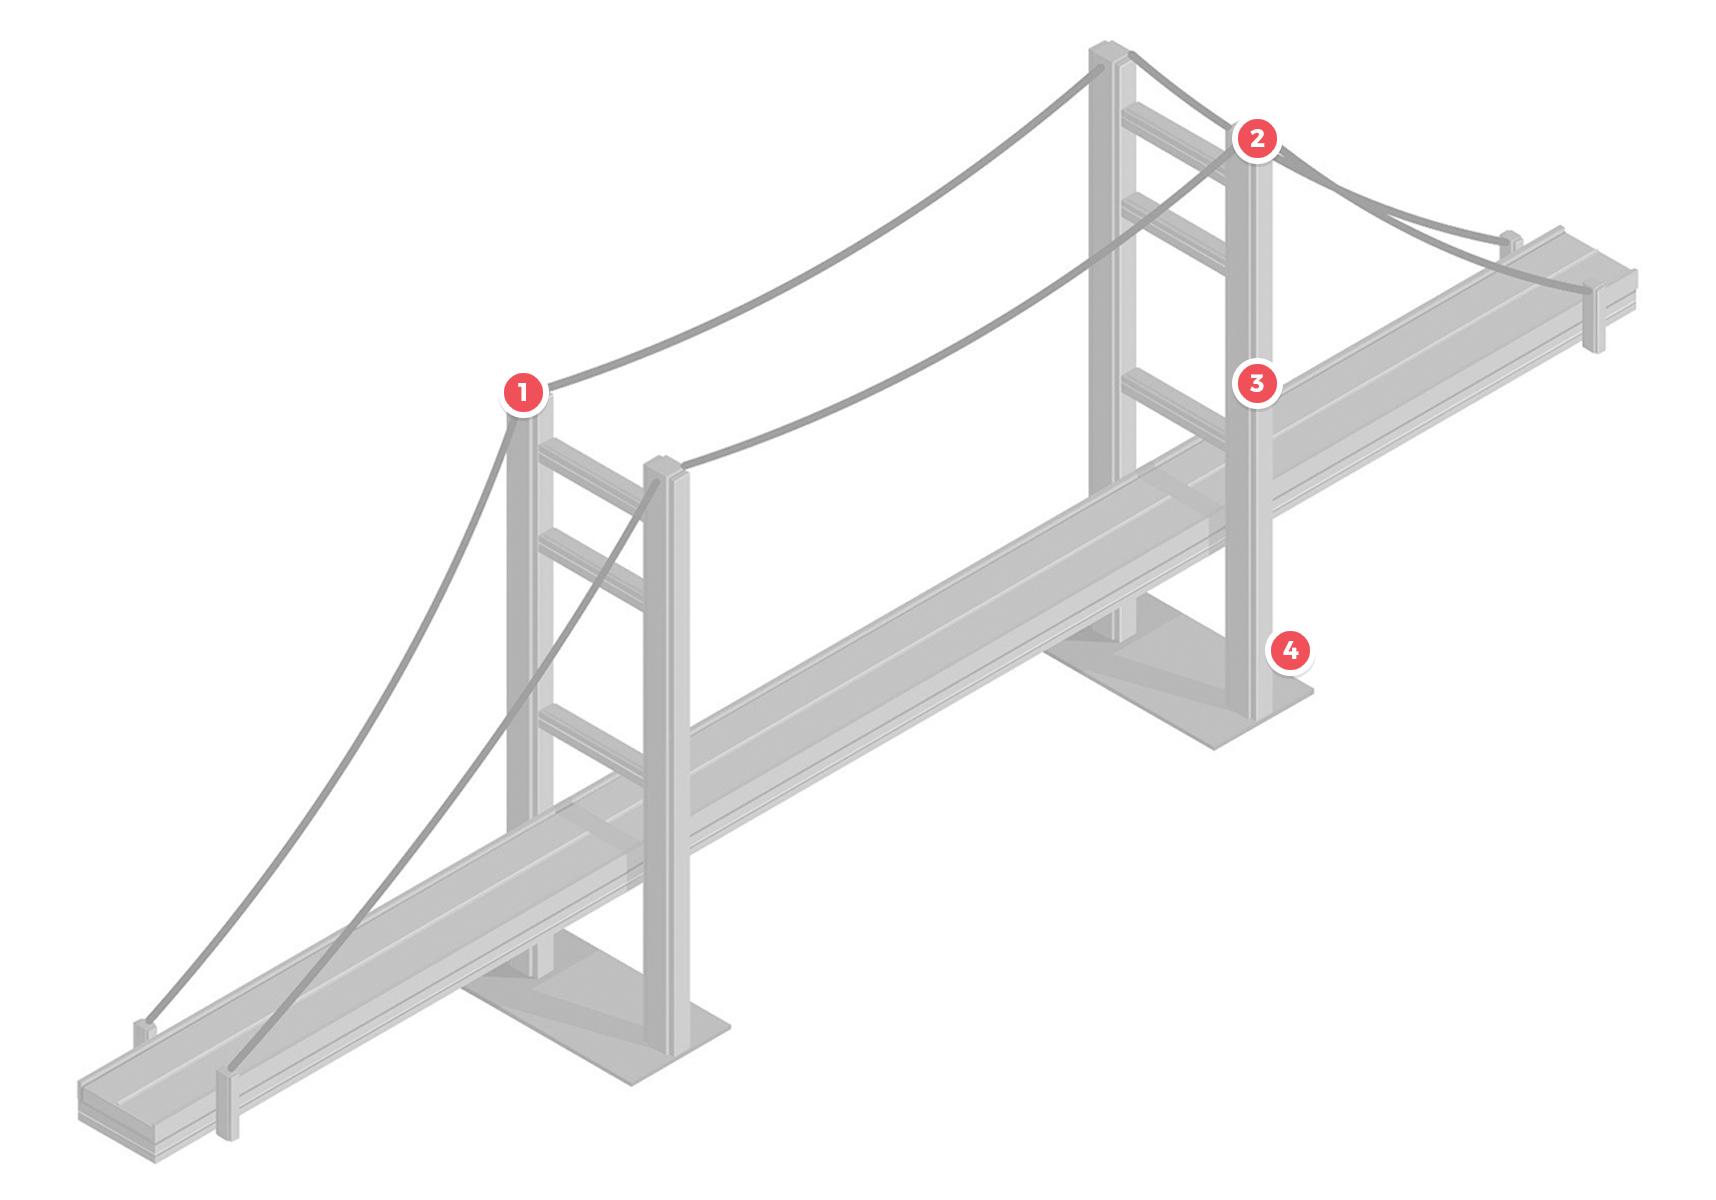 delta-box_aplicaciones_balizaje-ouvrages-art_schema-visuel